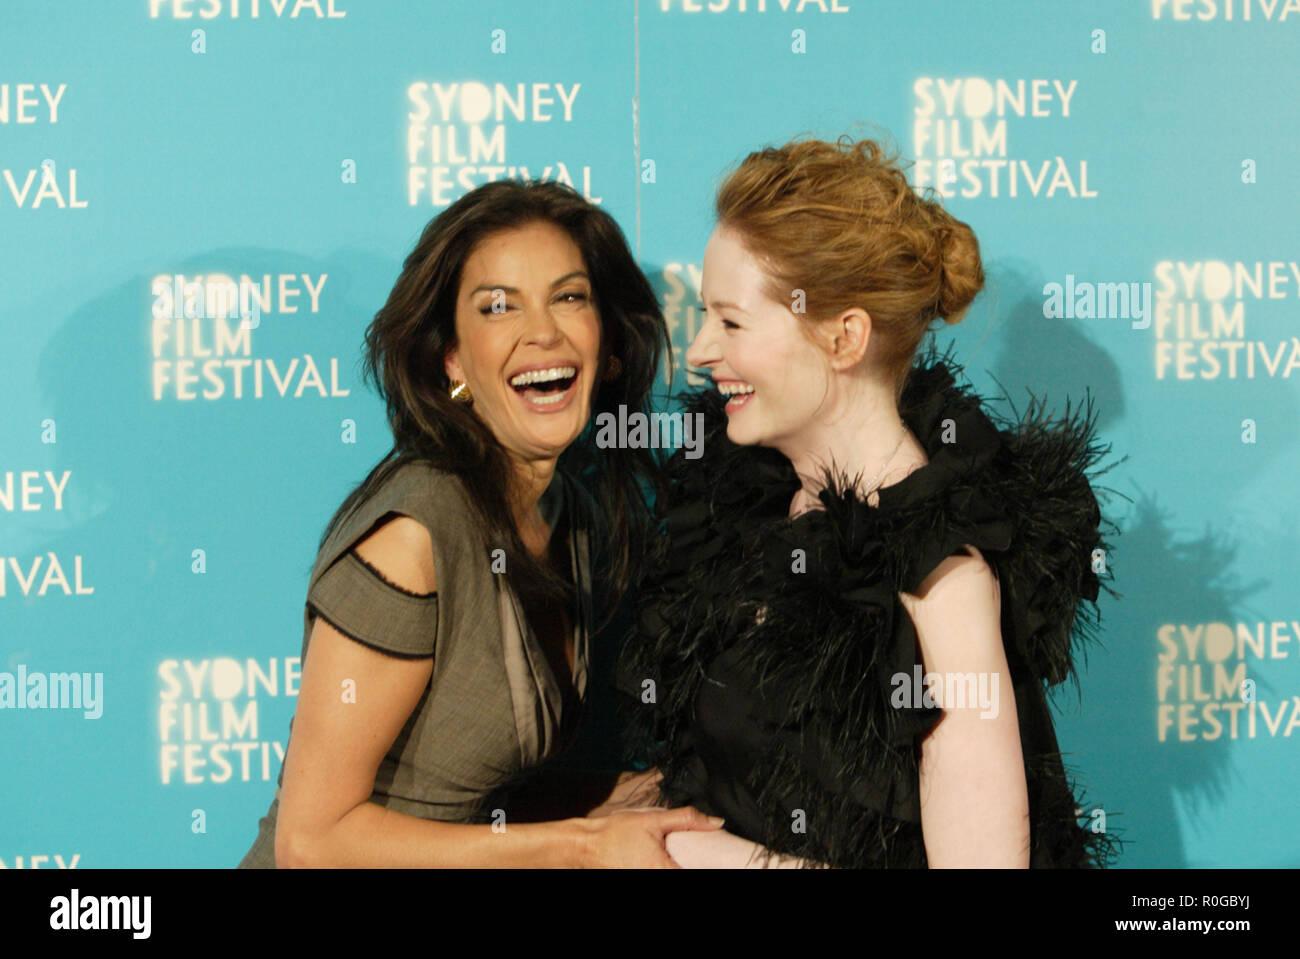 Teri Hatcher Attends The Premiere Of Coraline With Miranda Otto As Part Of The Sydney Film Festival Sydney Australia 10 06 09 Stock Photo Alamy